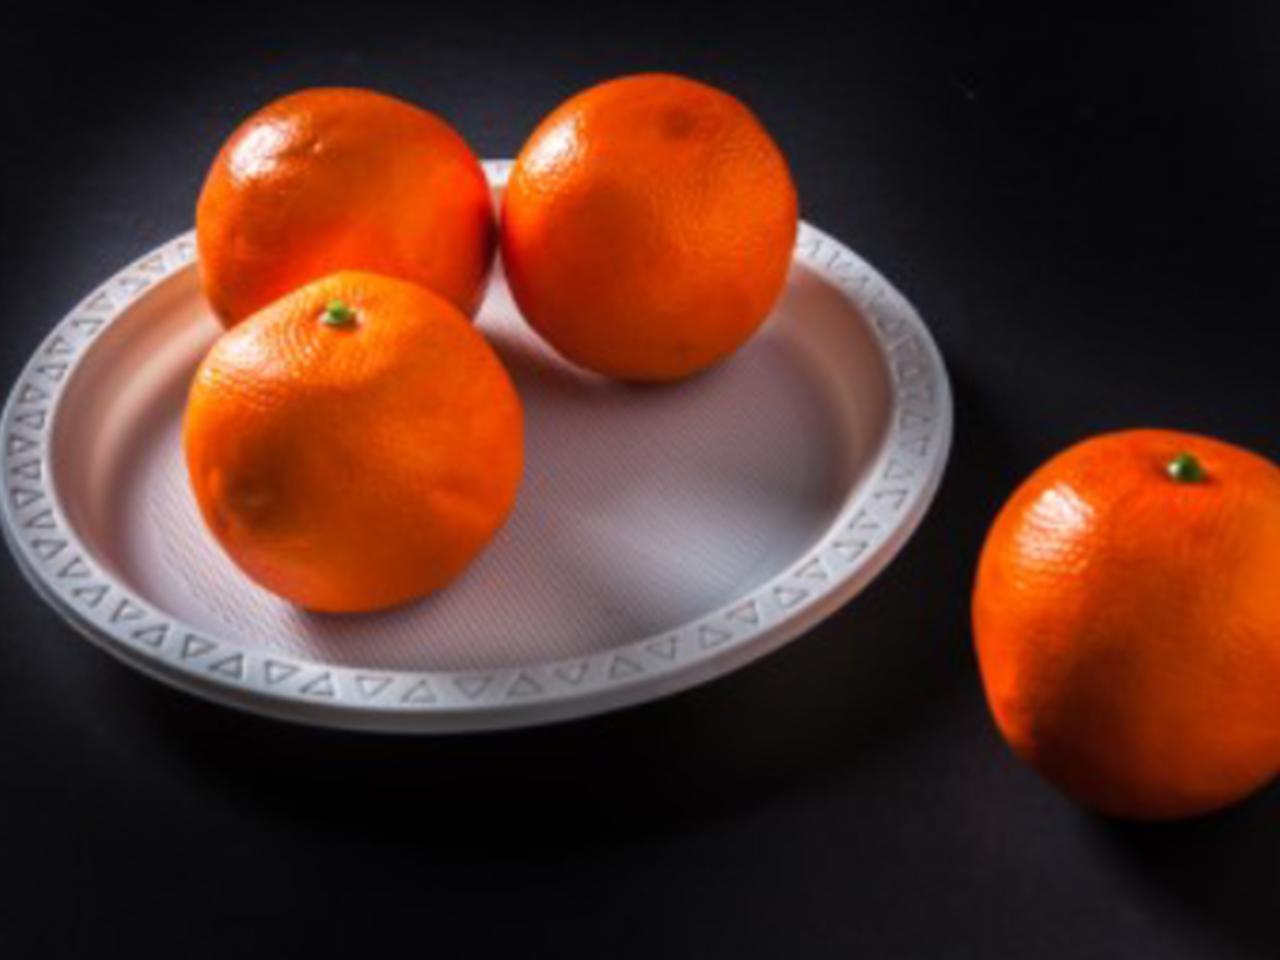 Advantages of disposable degradable tableware